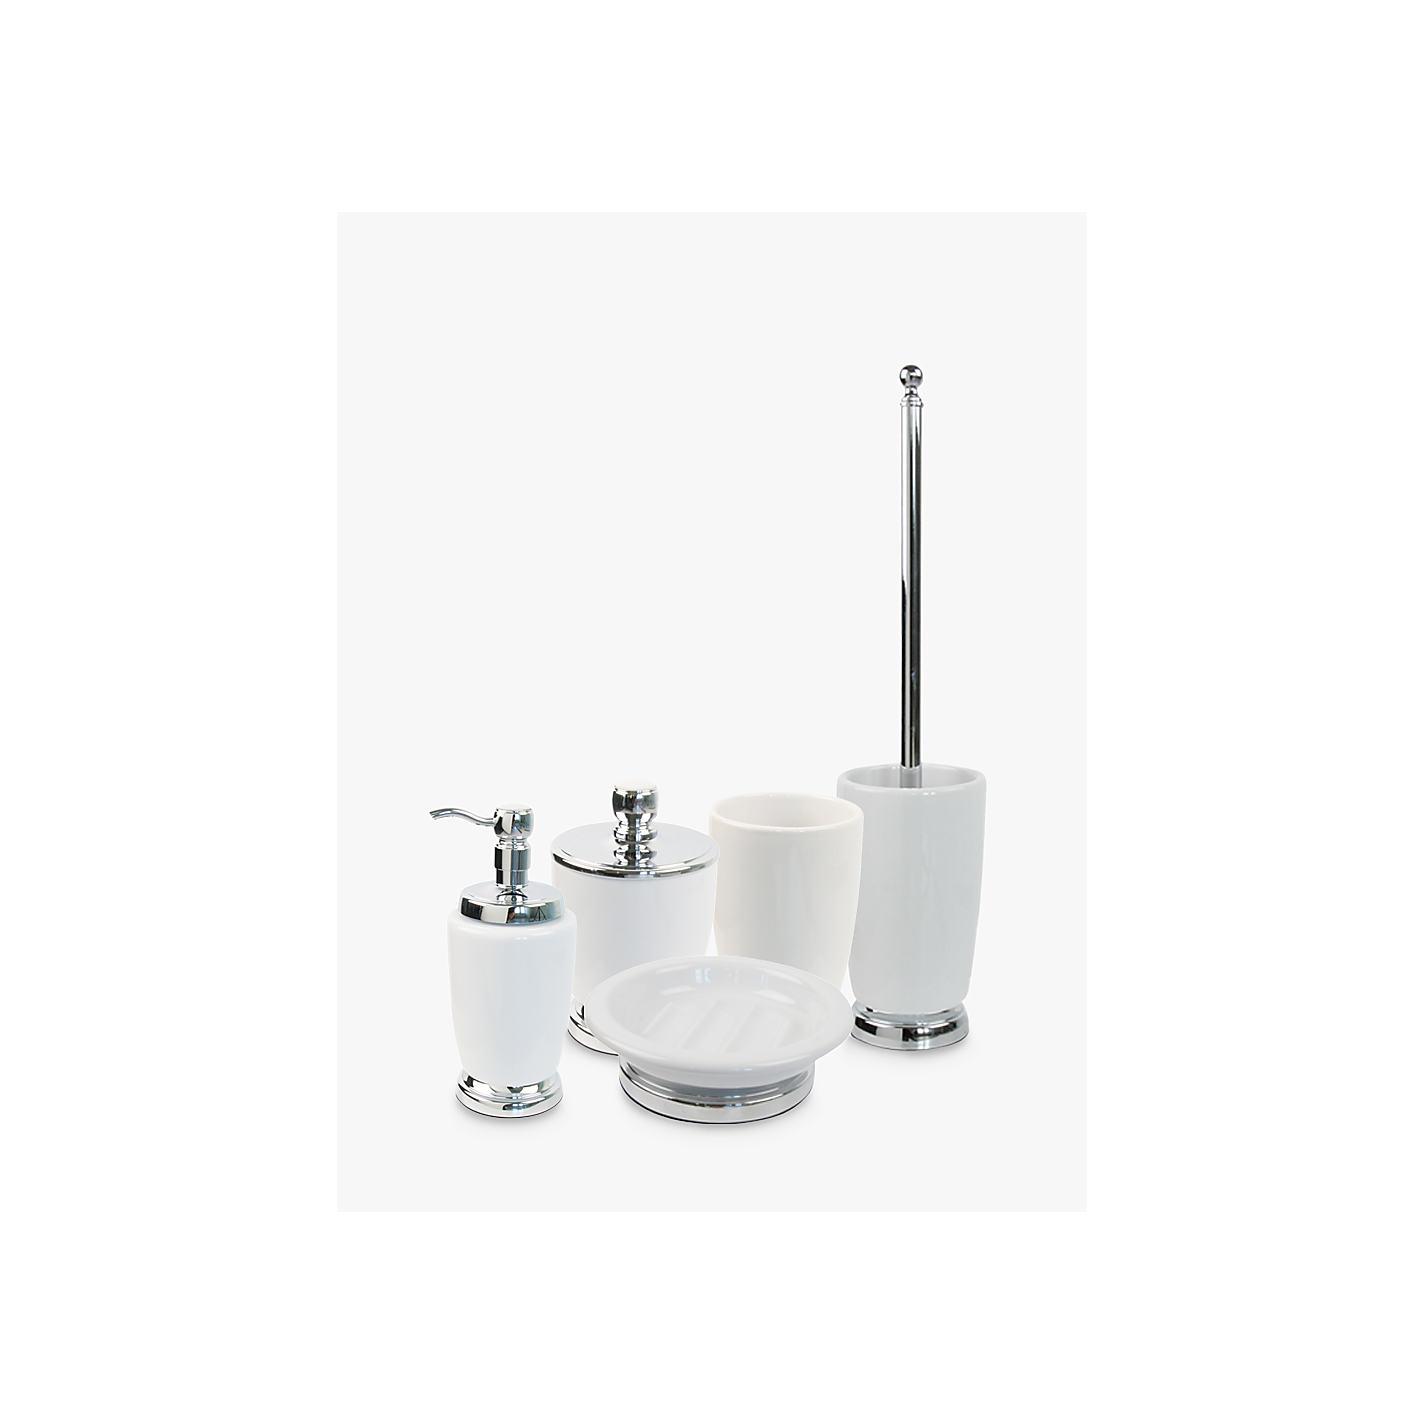 Bathroom accessories john lewis - Buy Miller Premium Bathroom Accessories Online At Johnlewis Com